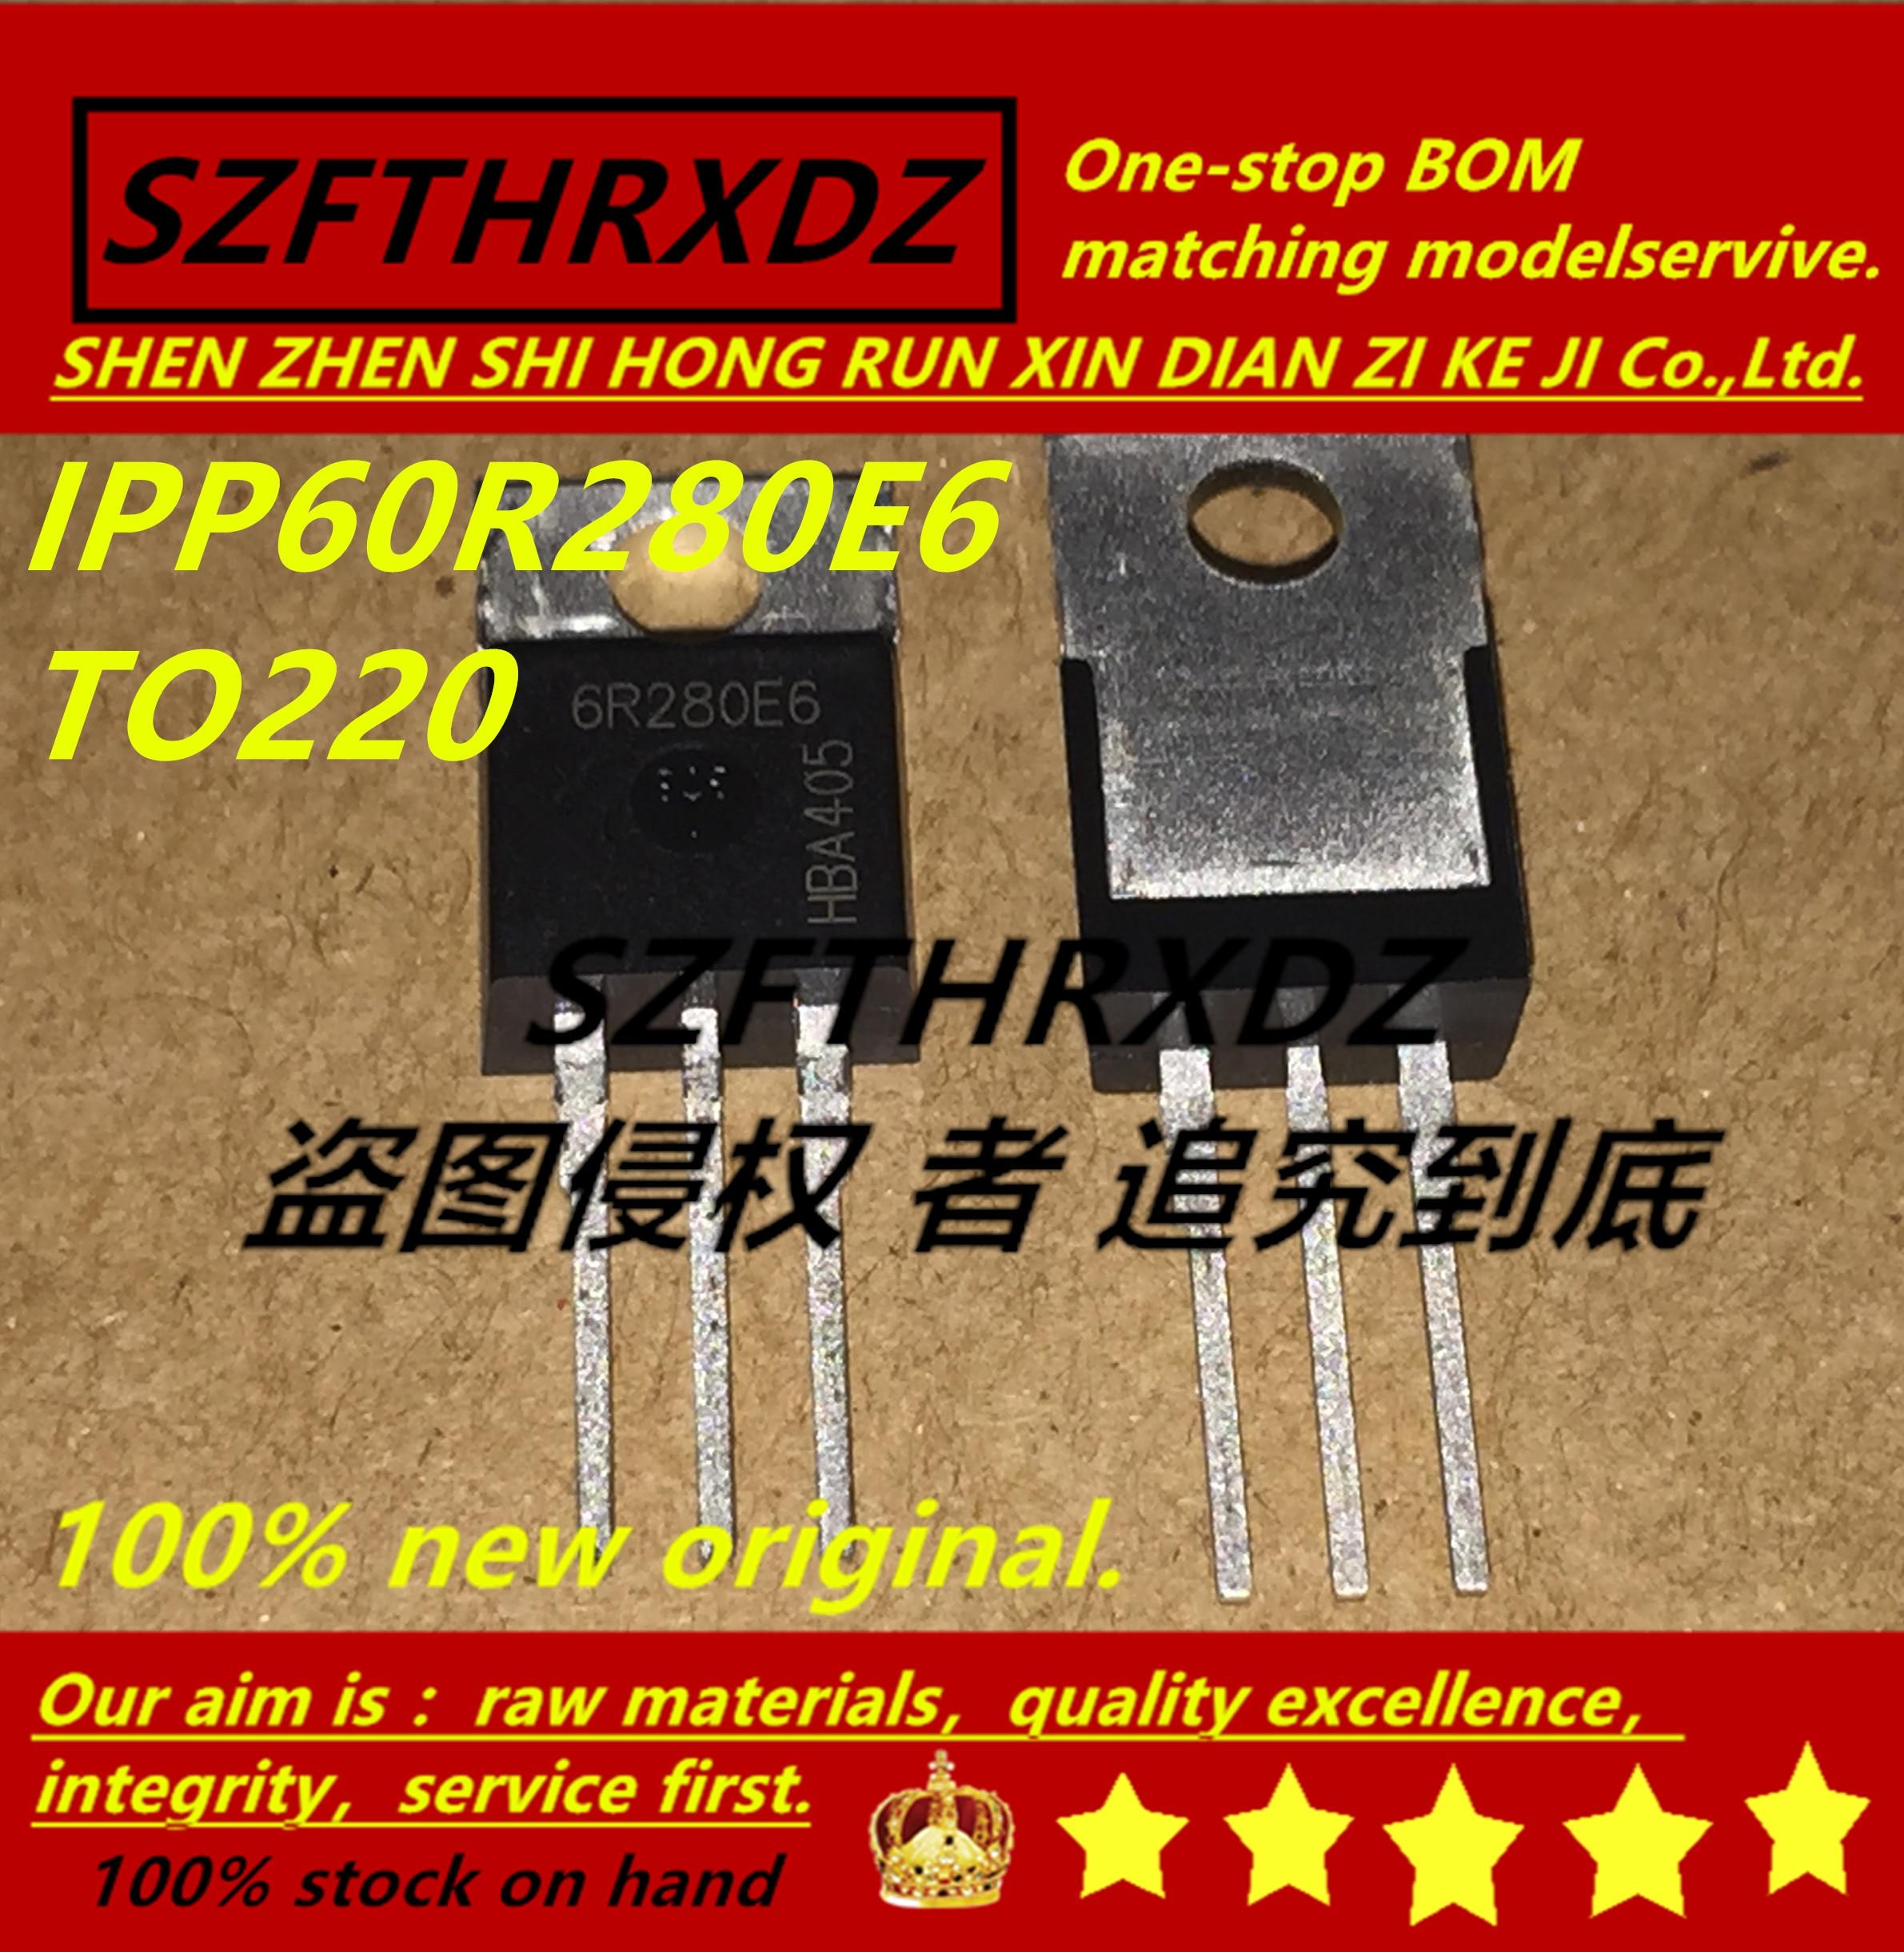 SZFTHRXDZ 100% nuevo original (10 uds) 16CTQ100PBF 16CTQ100 IPP60R280E6 6R280E6 IRL3103PBF IRL3103 DSA20C45PB TO220